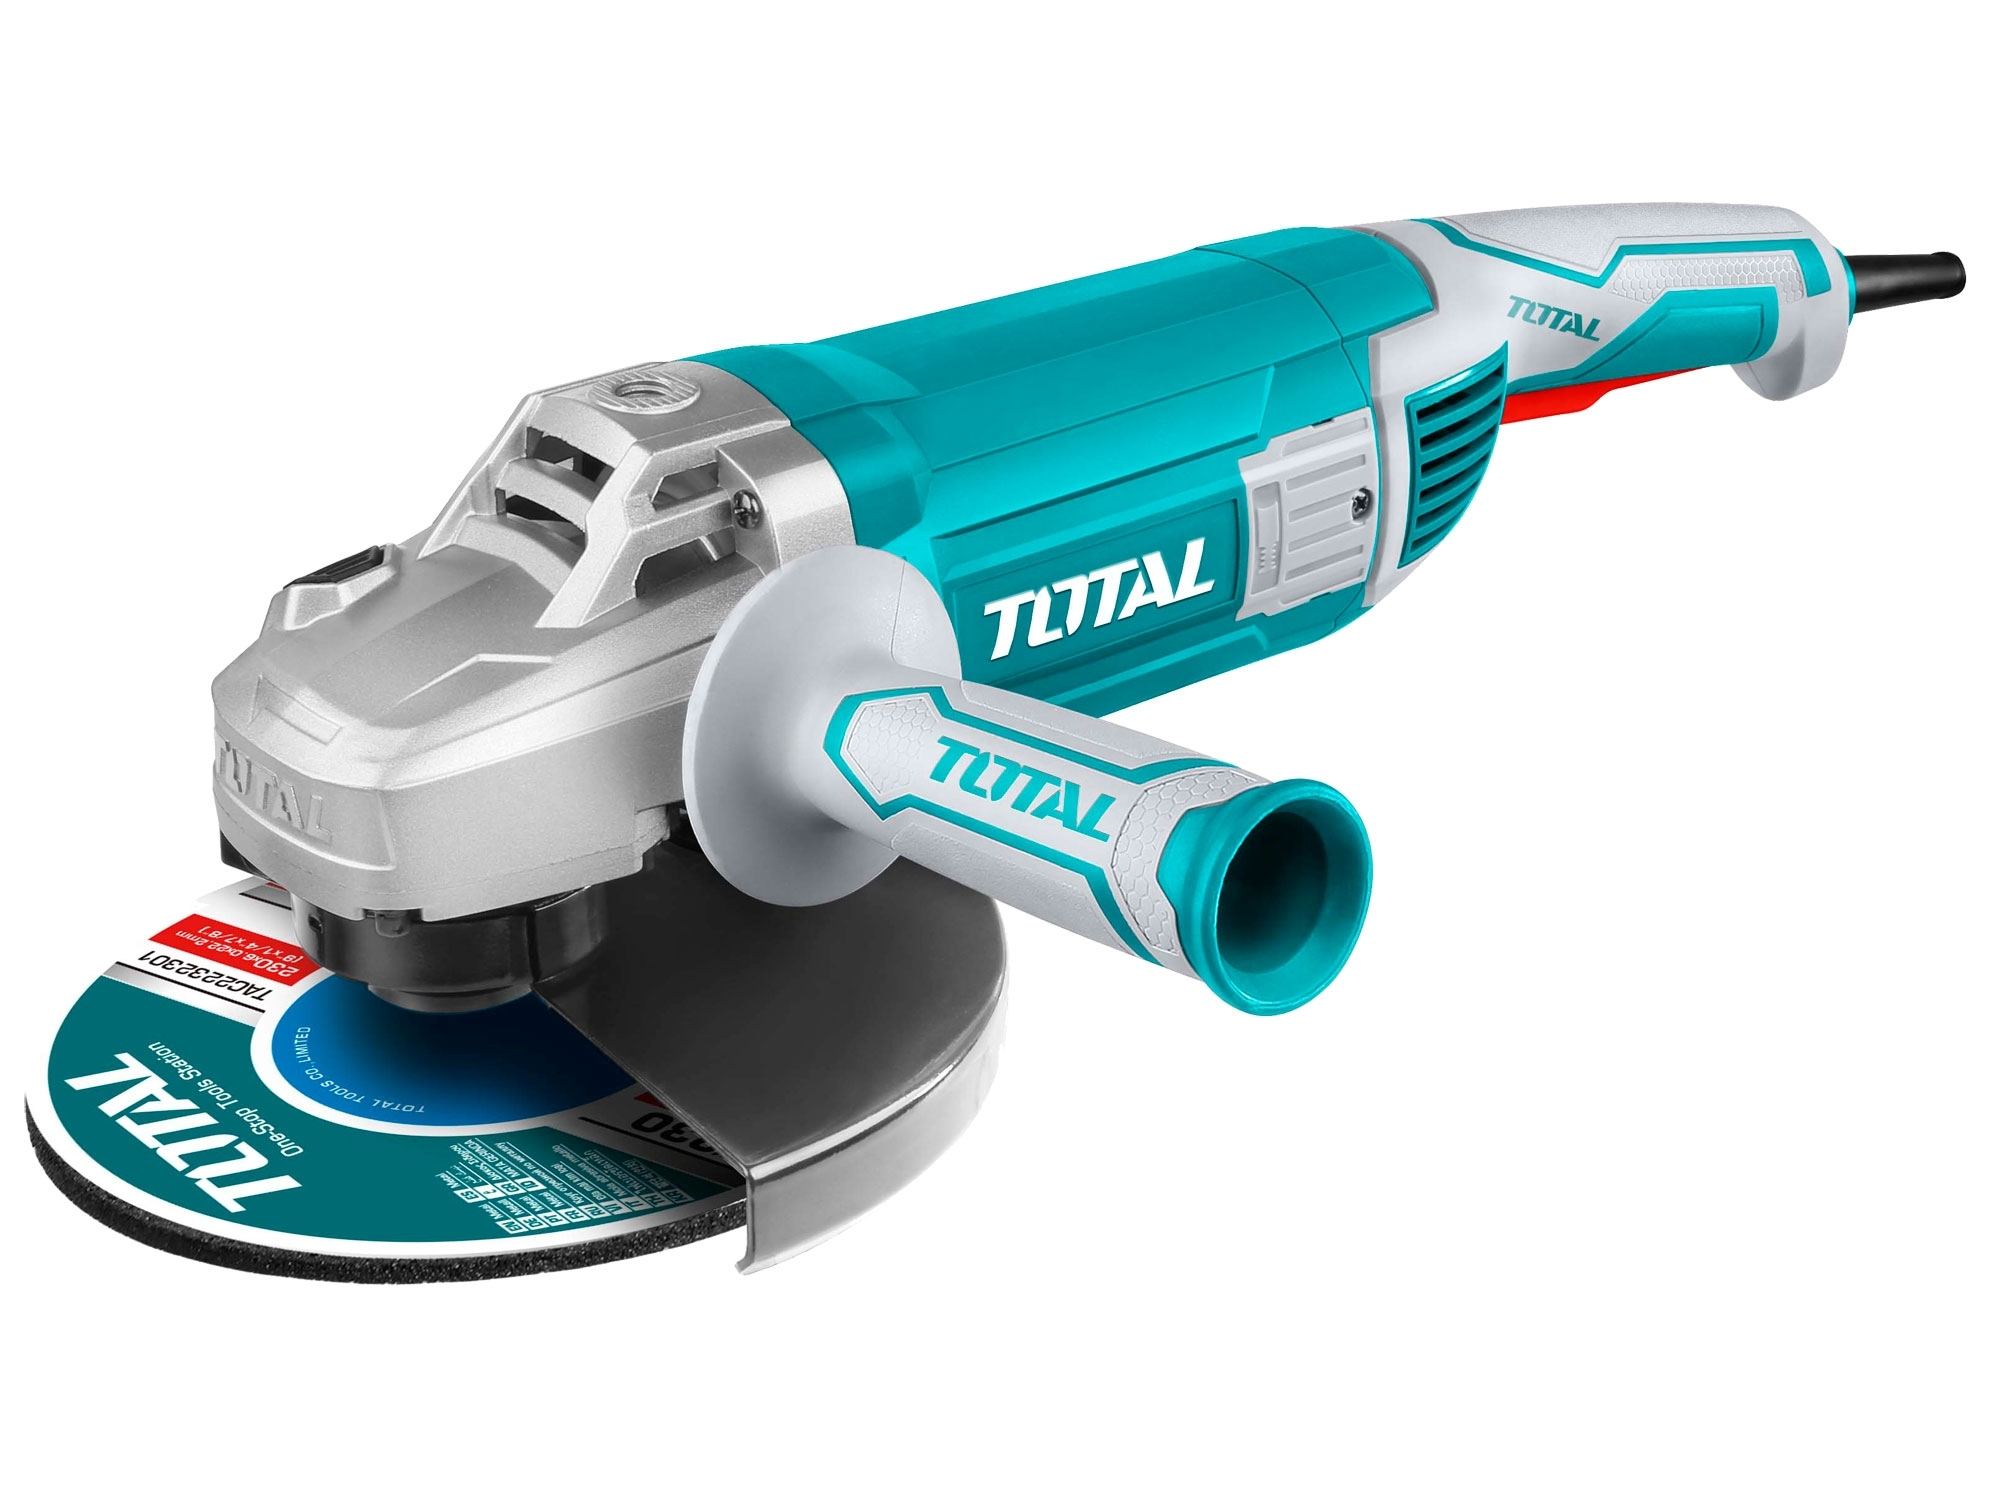 TOTAL TG1252306 bruska úhlová, 230mm, 2400W, industrial